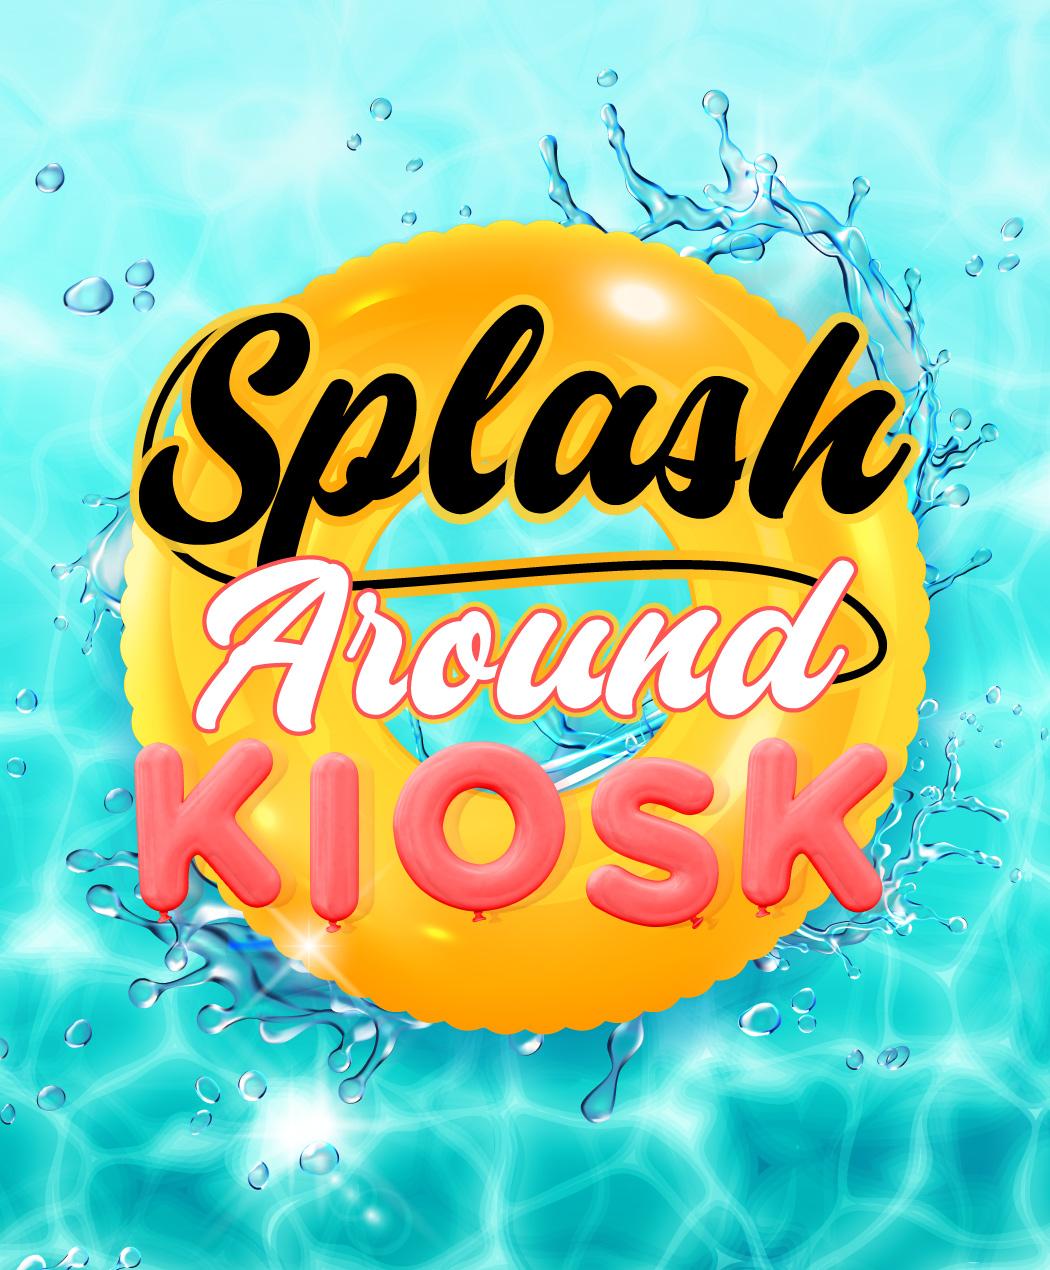 Splash Around Kiosk